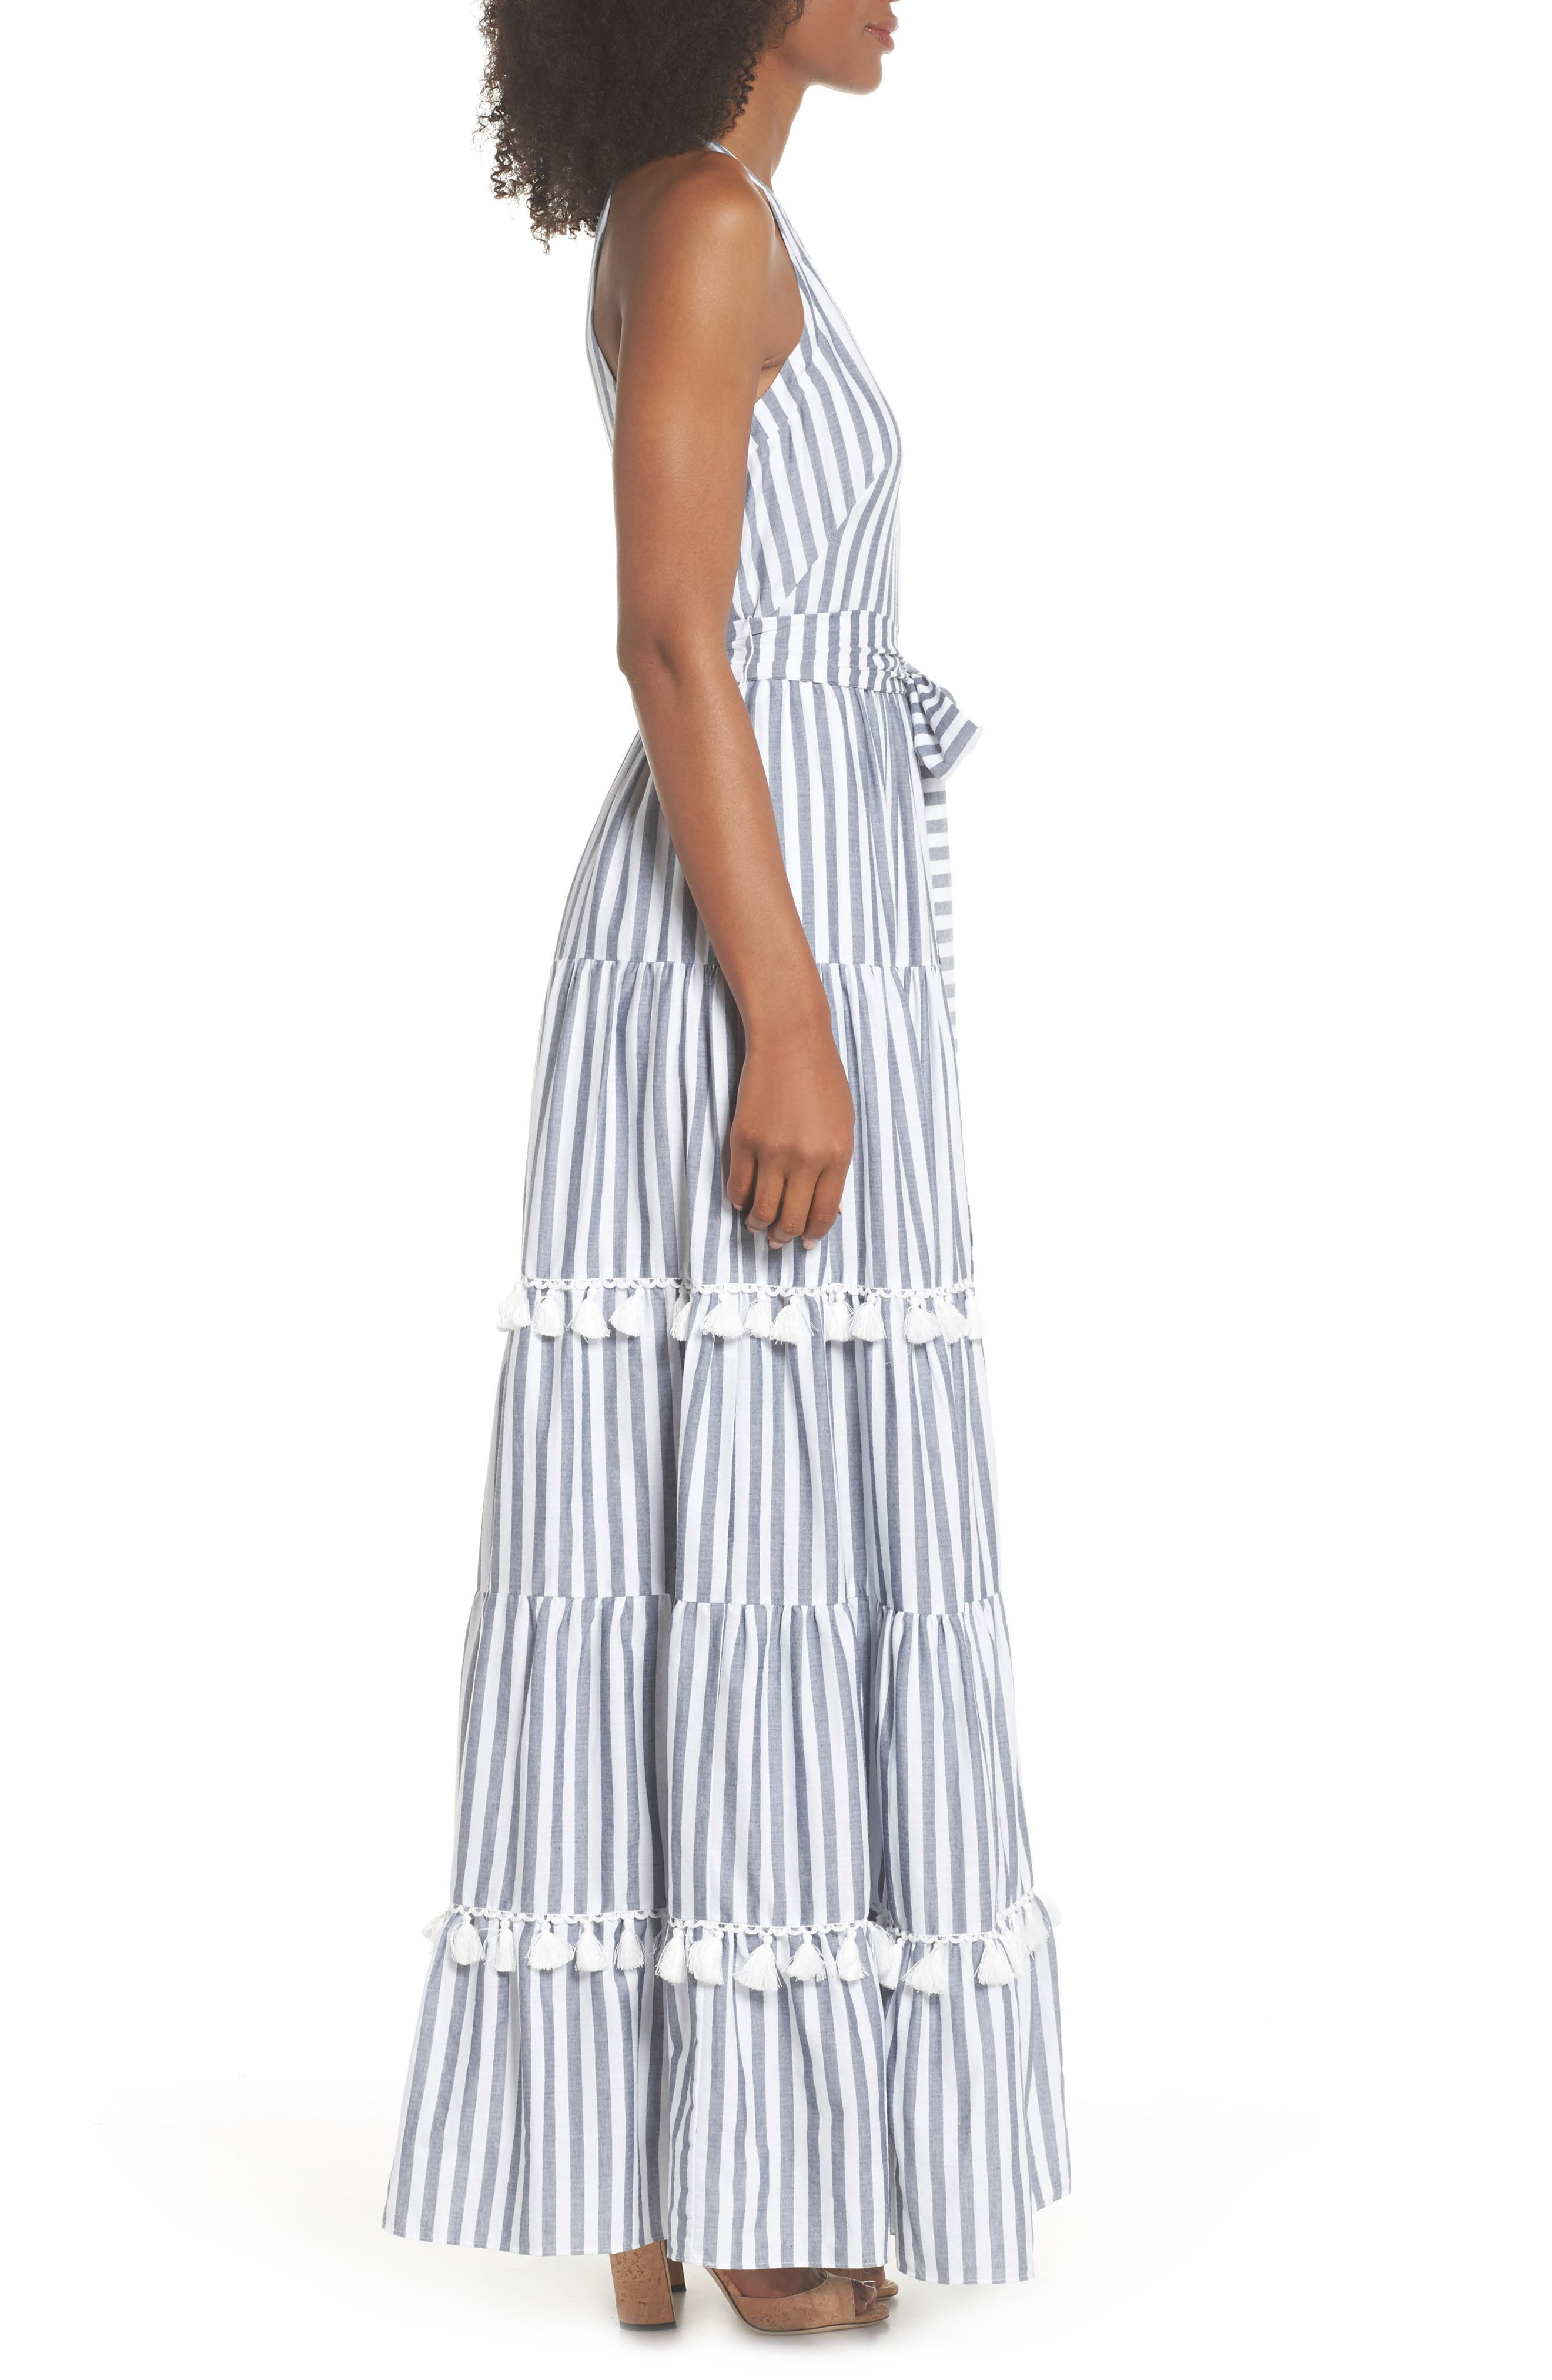 ELIZA J, Tiered Tassel Fringe Cotton Maxi Dress, Alternate thumbnail 4, color, IVORY/ GREY